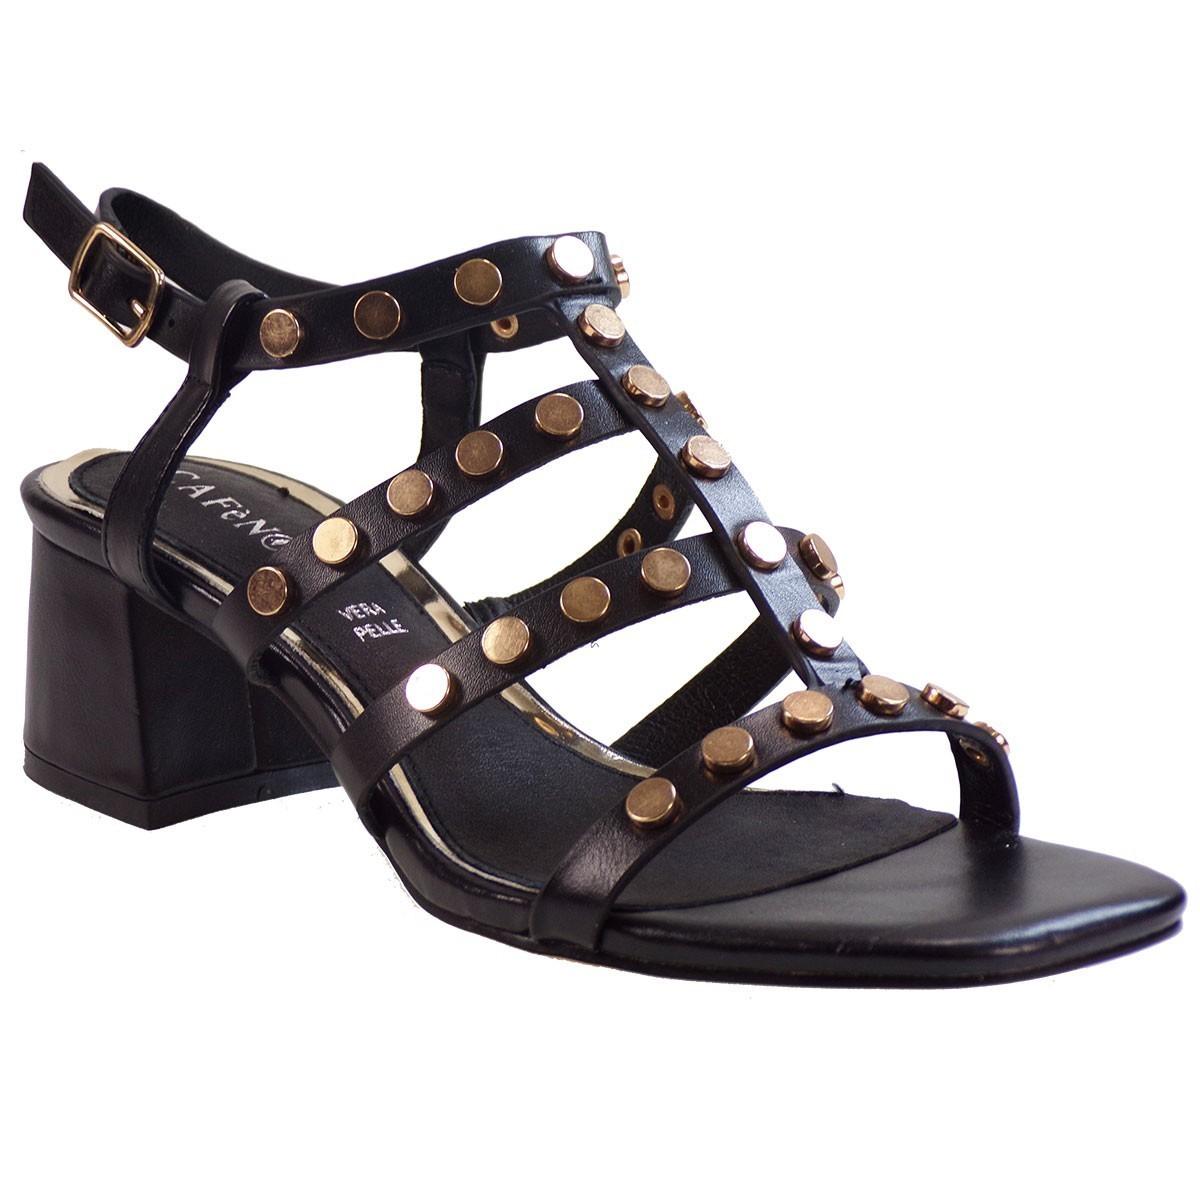 Cafe Noir Γυναικεία Παπούτσια Πέδιλα ILB936 Μαύρο 887292584